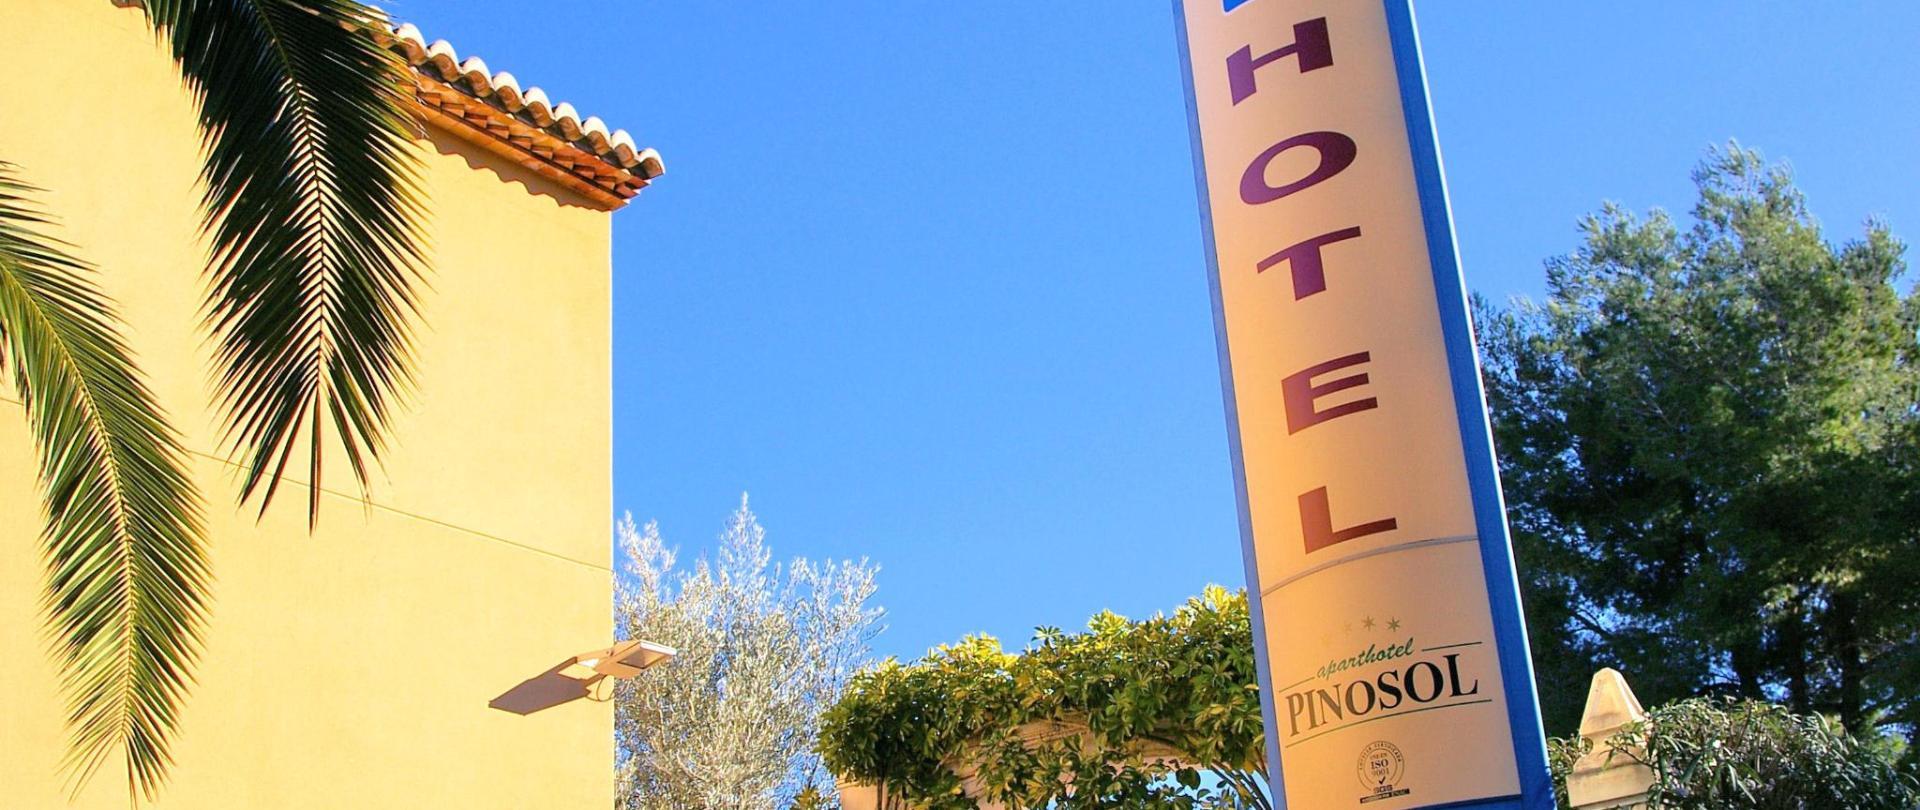 pinosol hotel (2) .jpg